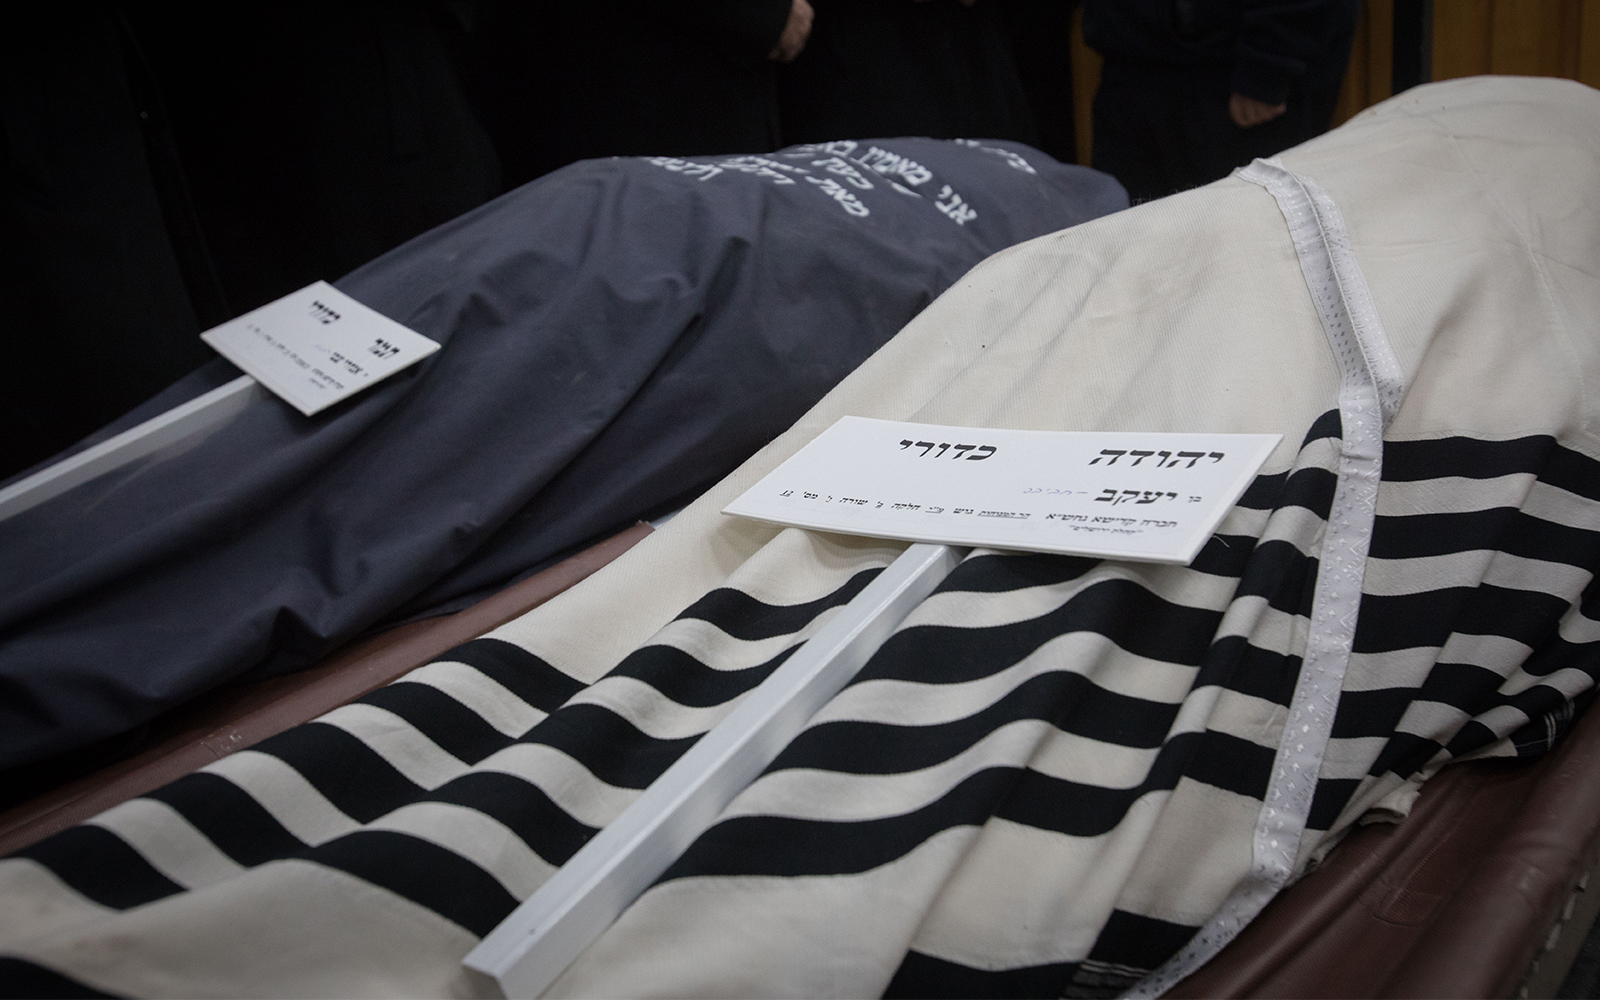 4eb7c6b5b47 The covered bodies of Yehuda and Tamar Kaduri at their funeral in  Jerusalem, January 14, 2019. (Noam Revkin Fenton/Flash90)